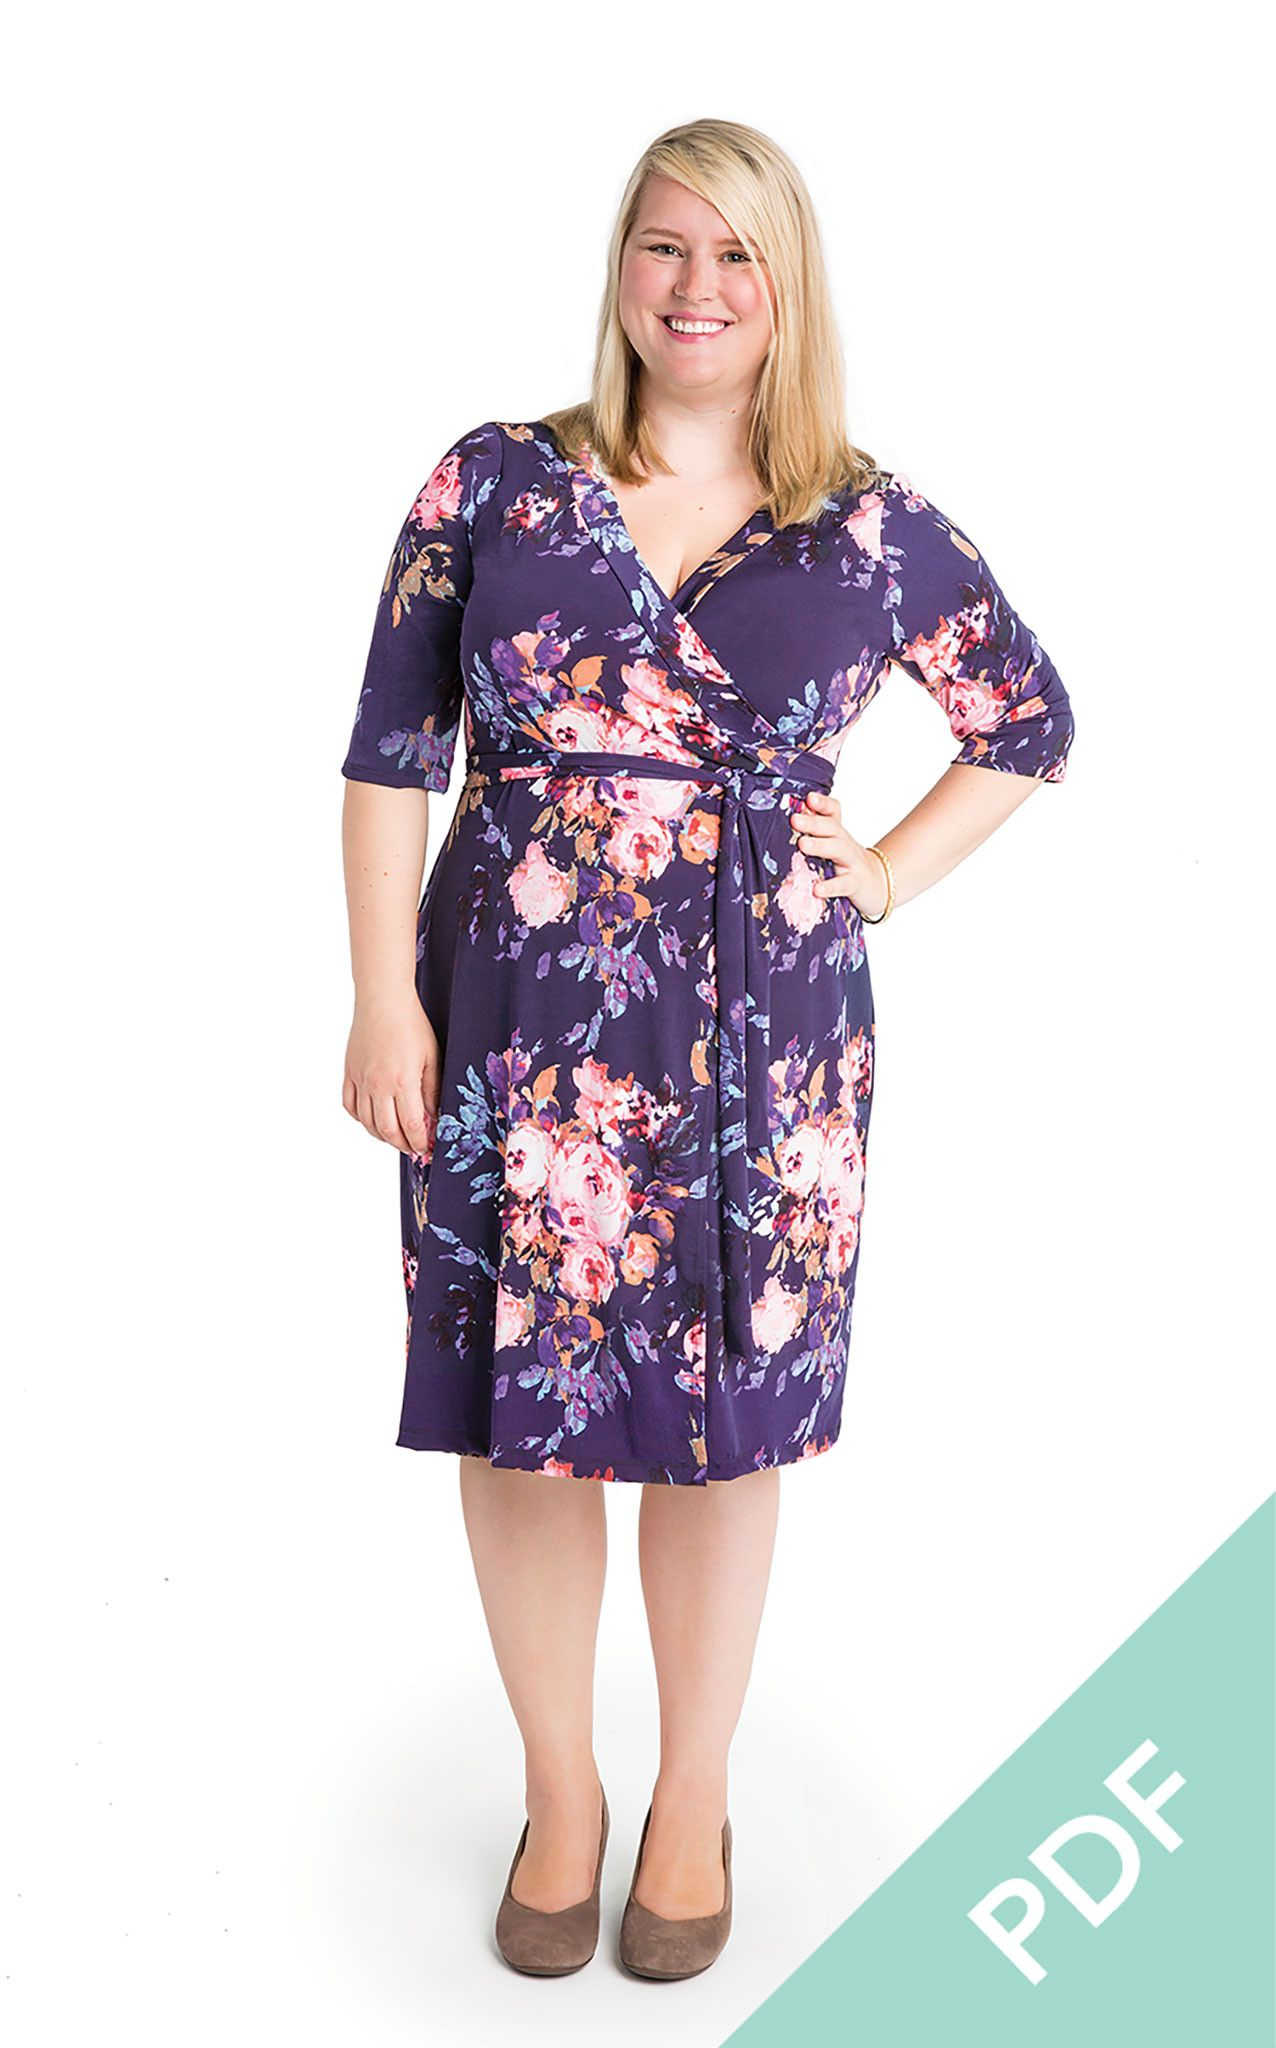 Appleton Dress PDF pattern | Tutoriales, Patrones y Costura